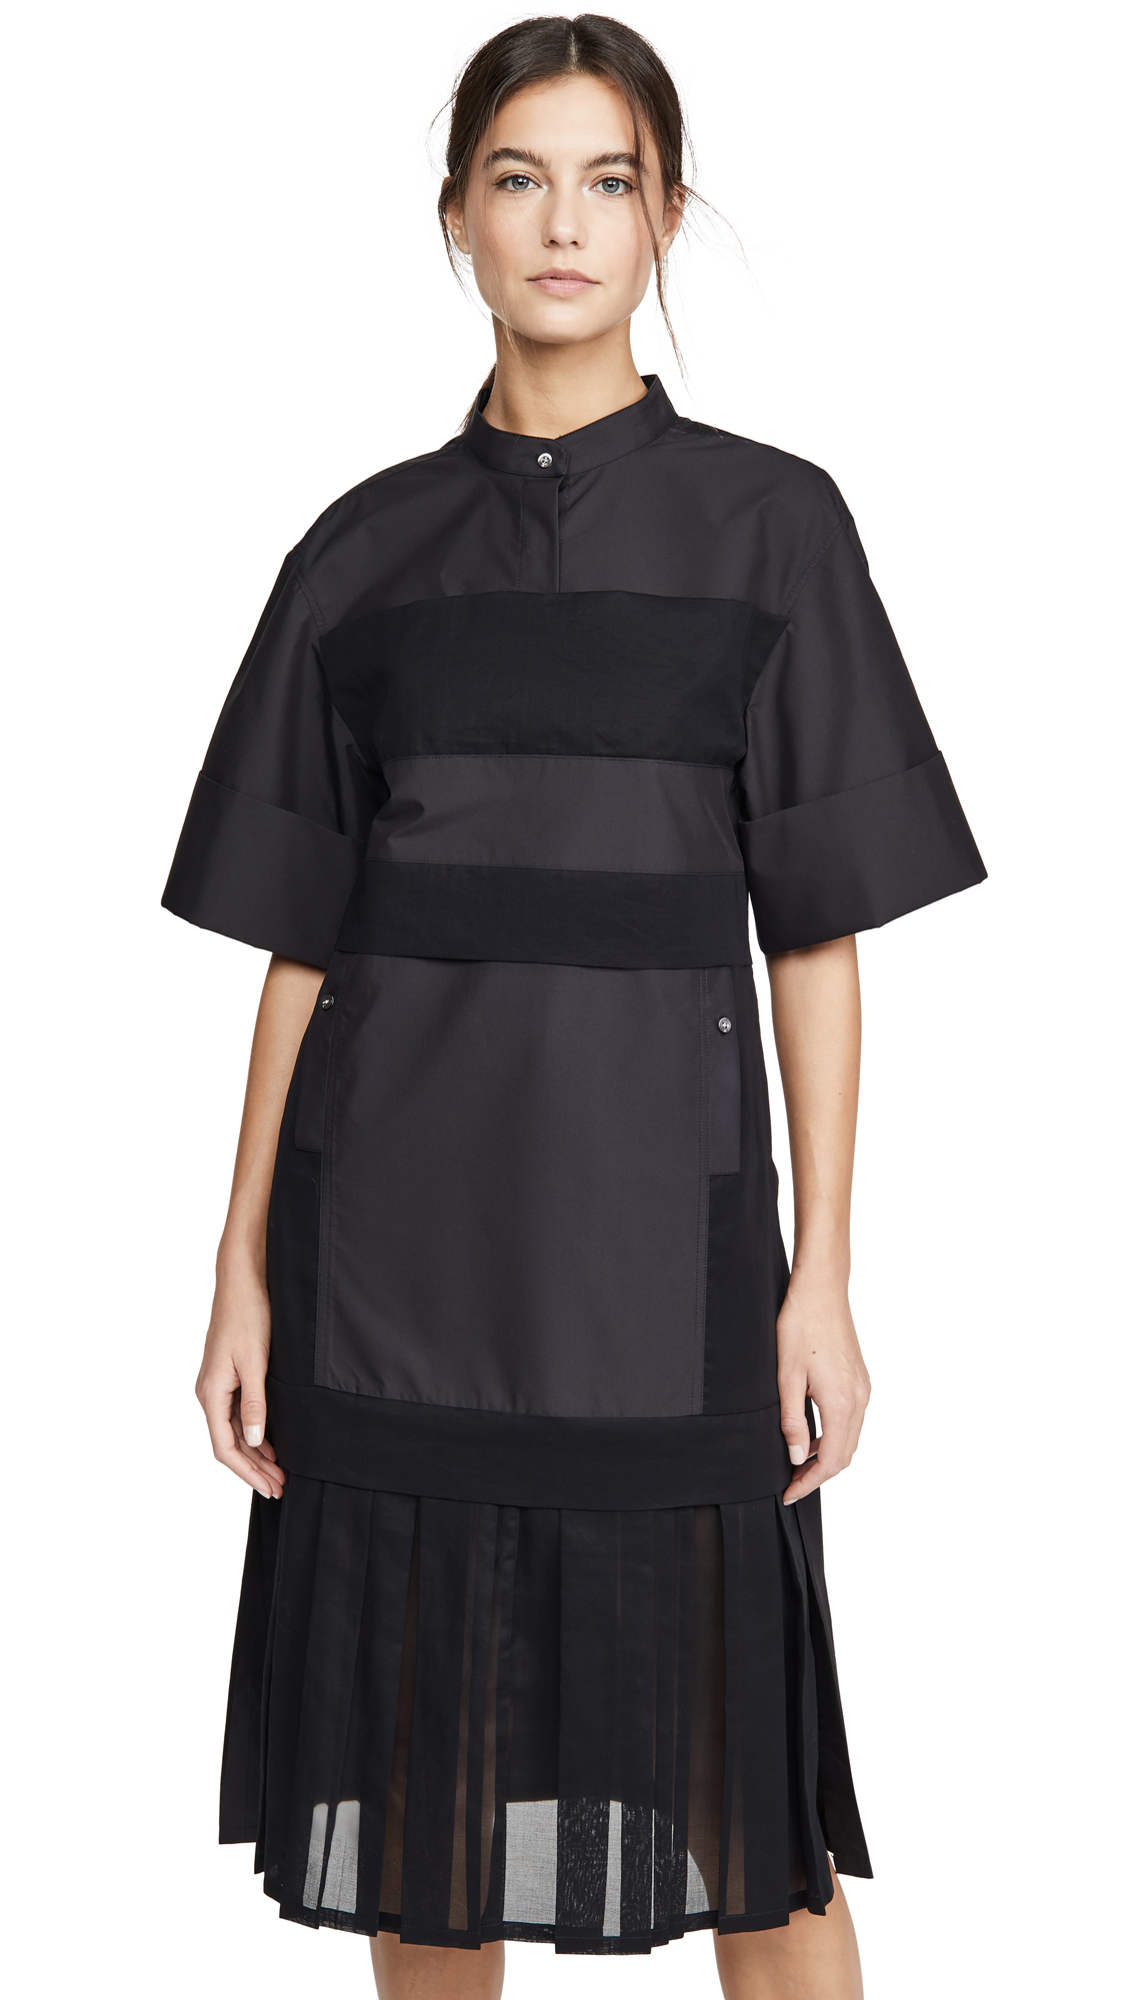 Buy 3.1 Phillip Lim Multimedia Dress with Pleated Hem online beautiful 3.1 Phillip Lim Clothing, Dresses